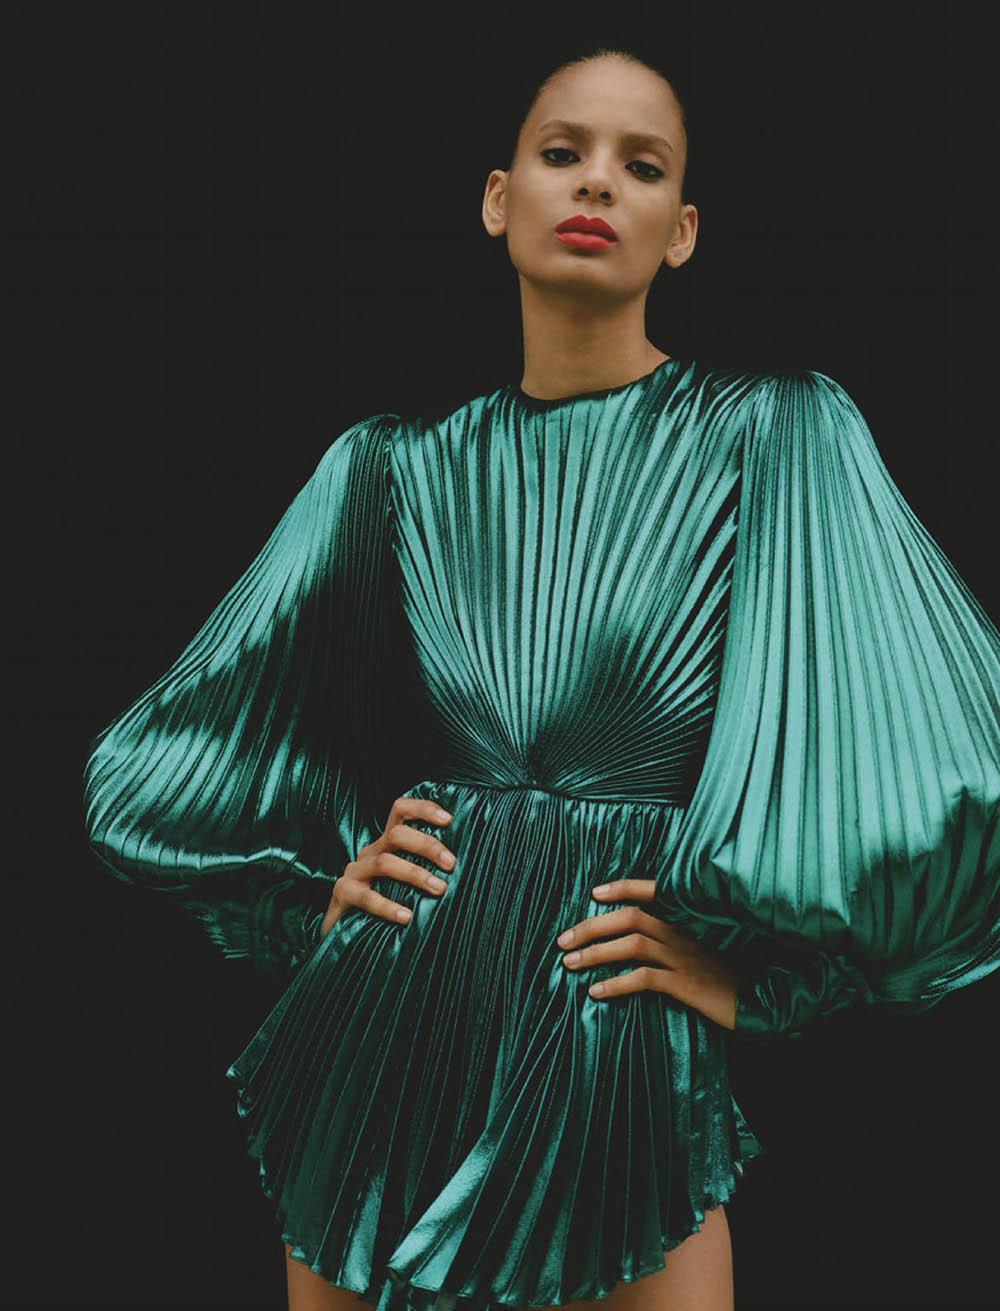 Annibelis Baez by Jeff Henrikson for Vogue Mexico September 2019